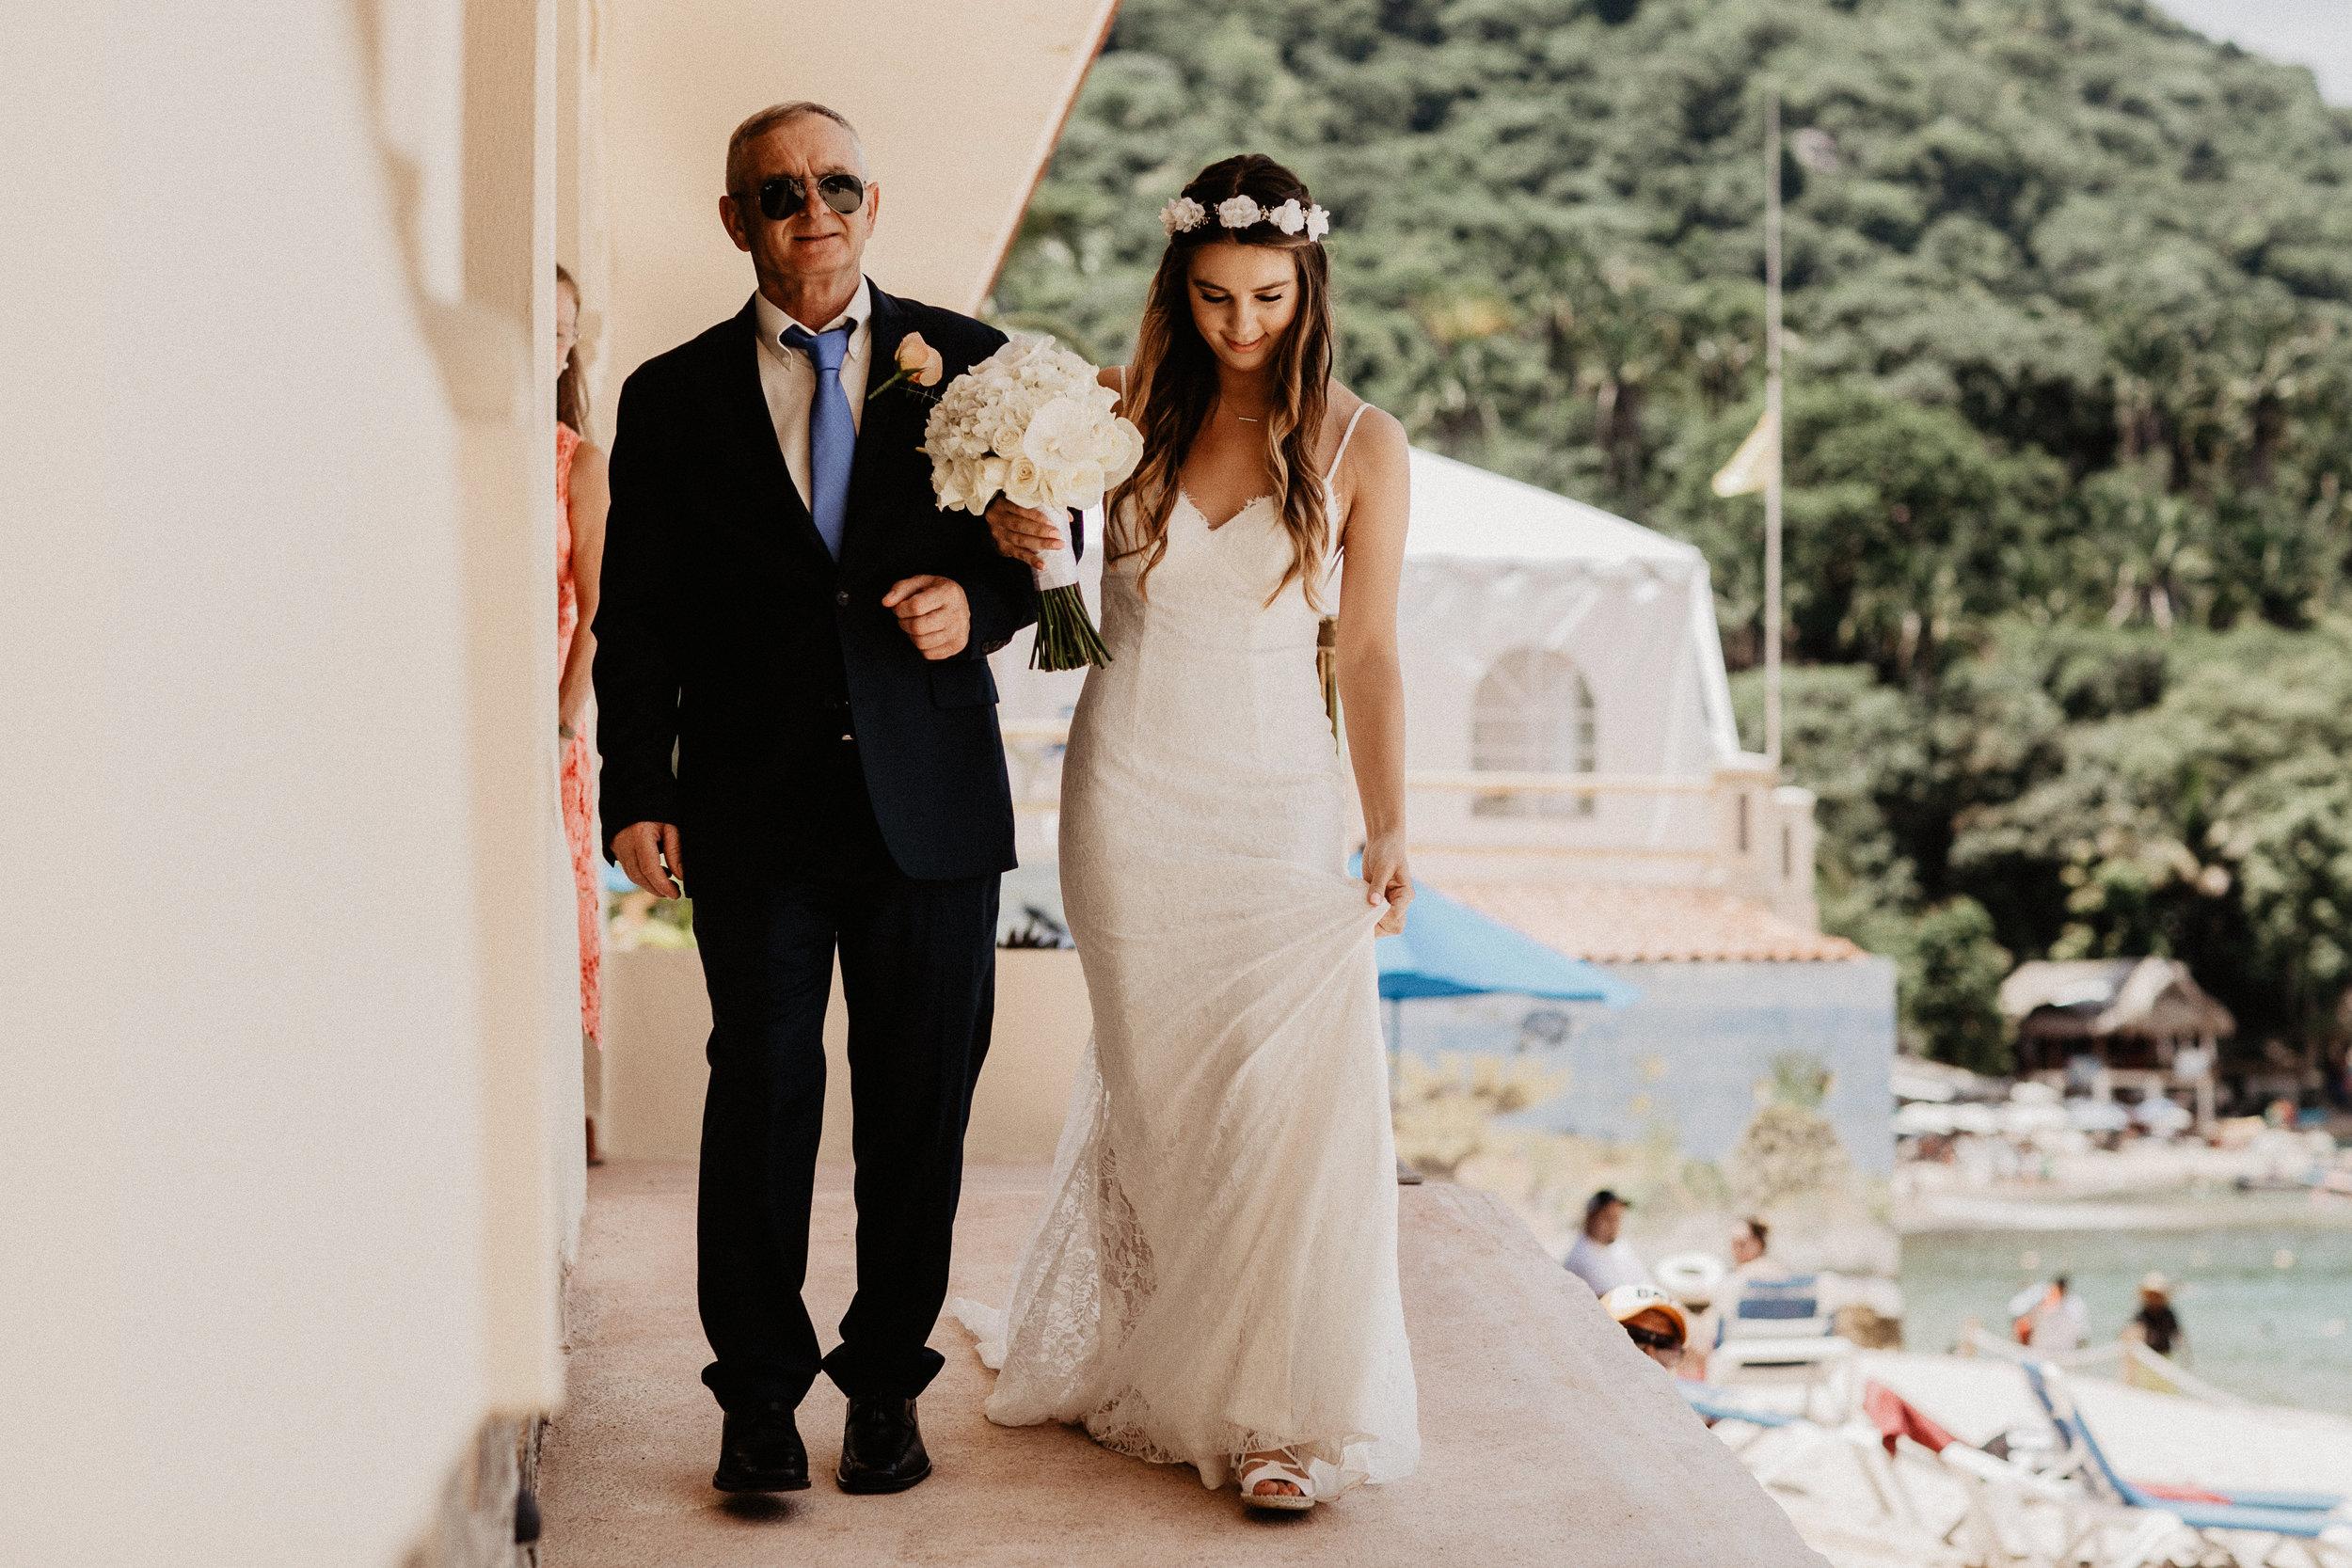 alfonso_flores_destination_wedding_photography_puerto_vallarta_hotel_barcelo_vallarta_cuttler_amela-213.JPG